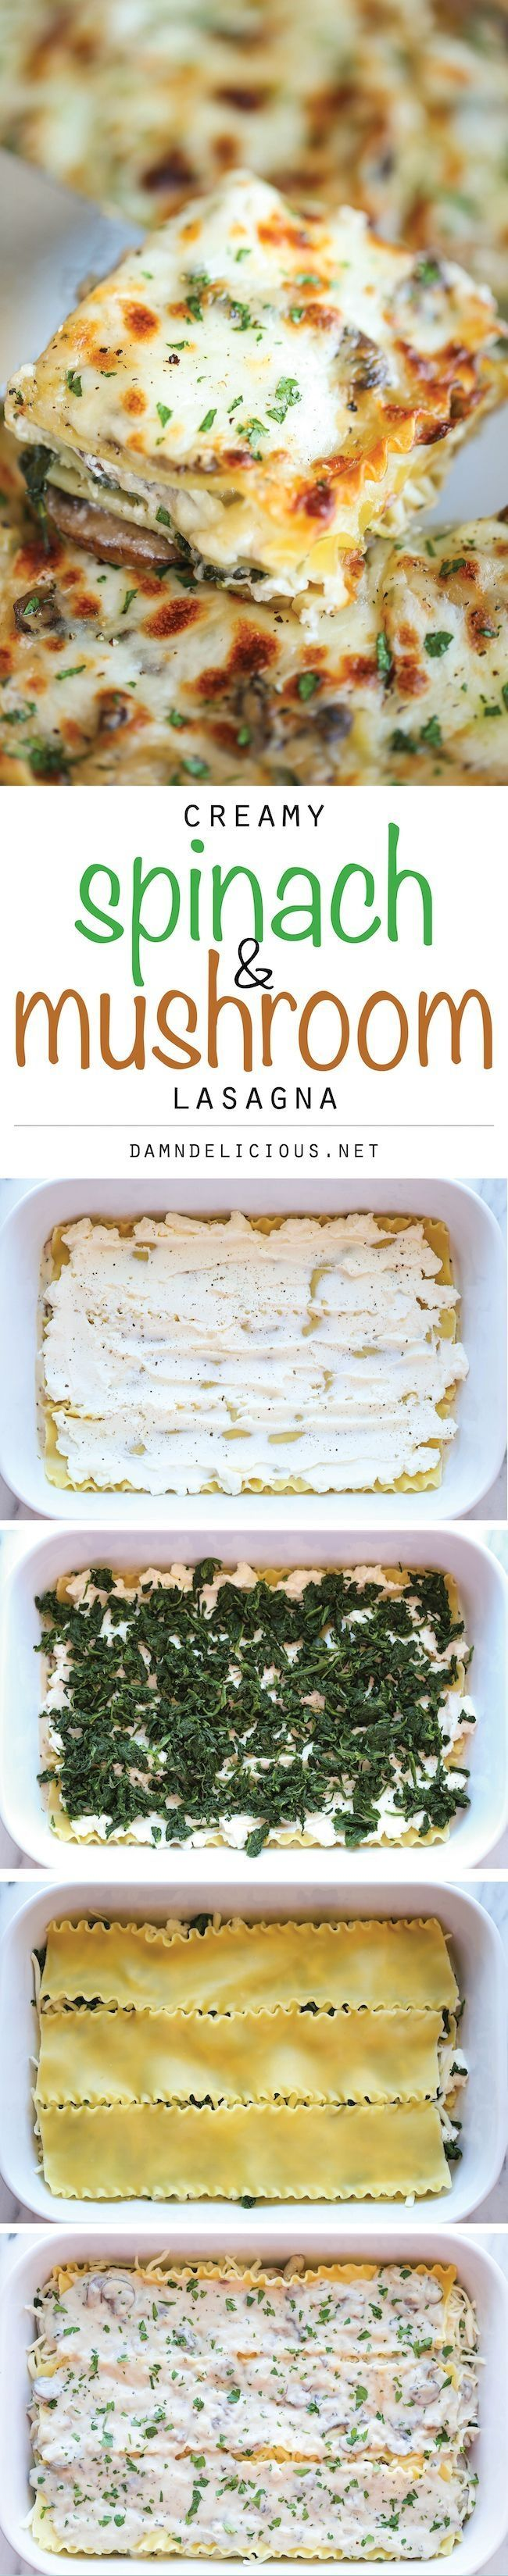 Creamy mushroom and spinach lasagna.  (Might be similar to…